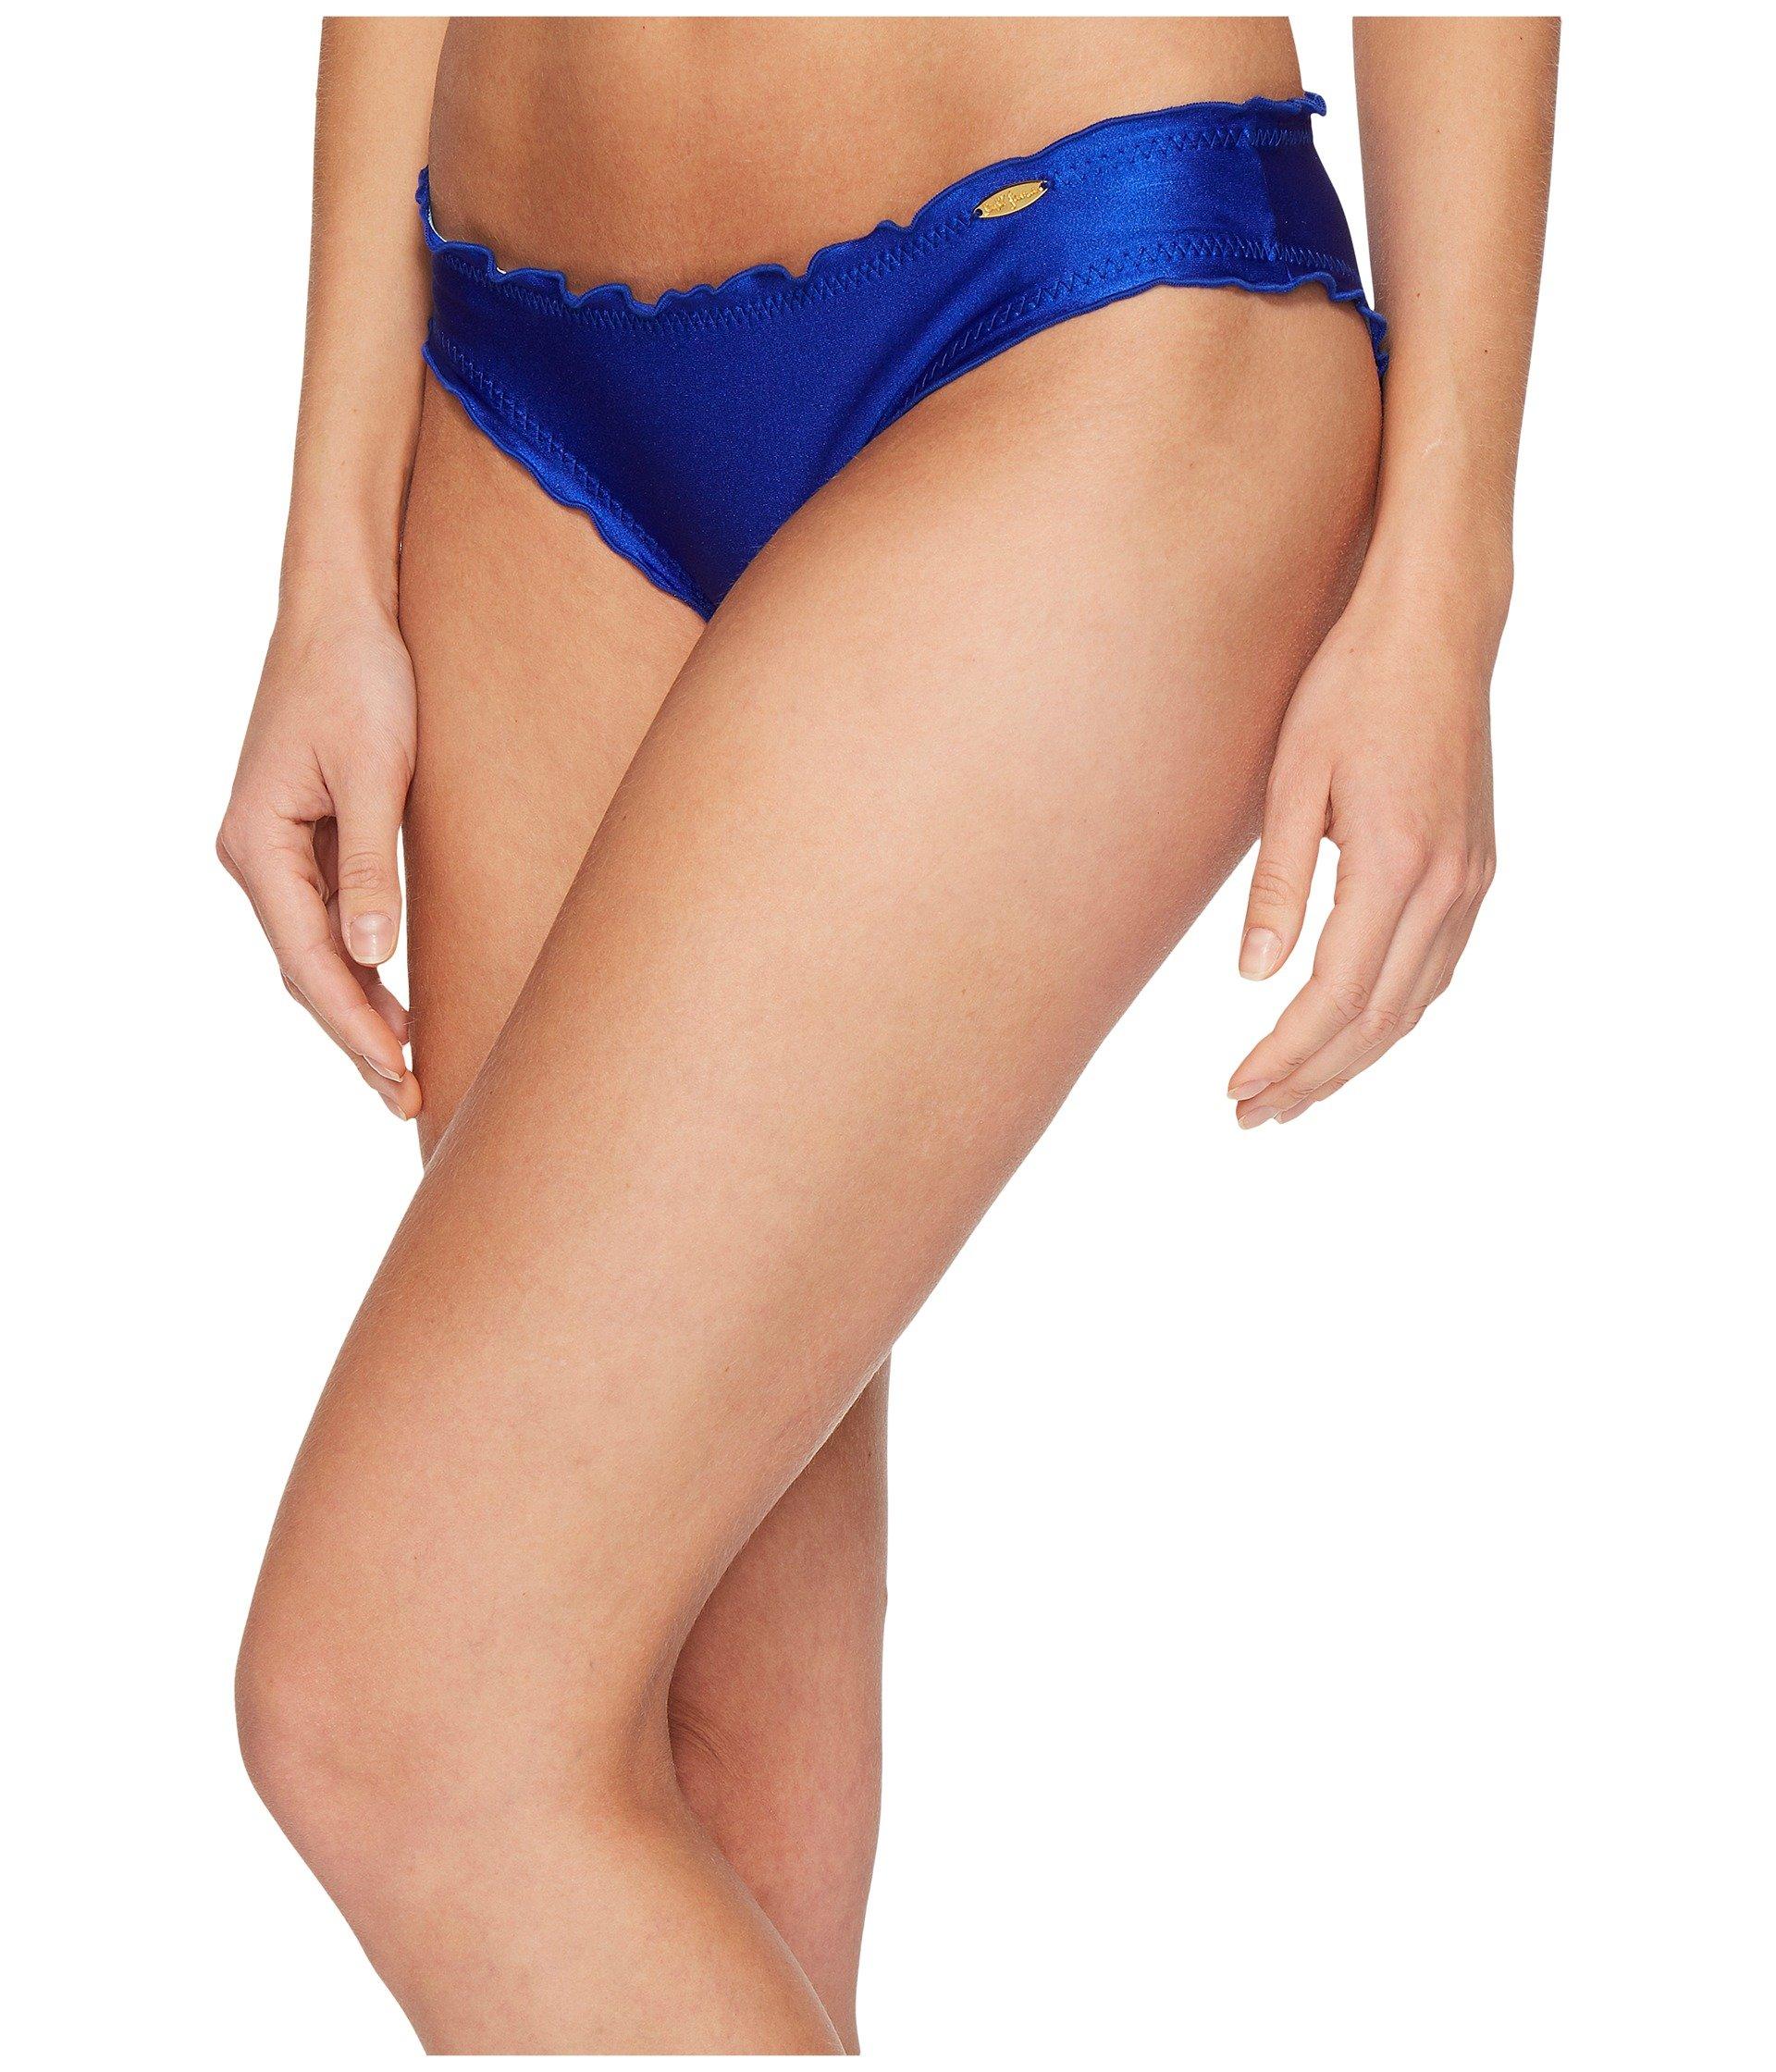 Luli Fama Cosita Buena Full Ruched Back Bikini Bottom At Zapposcom-8788